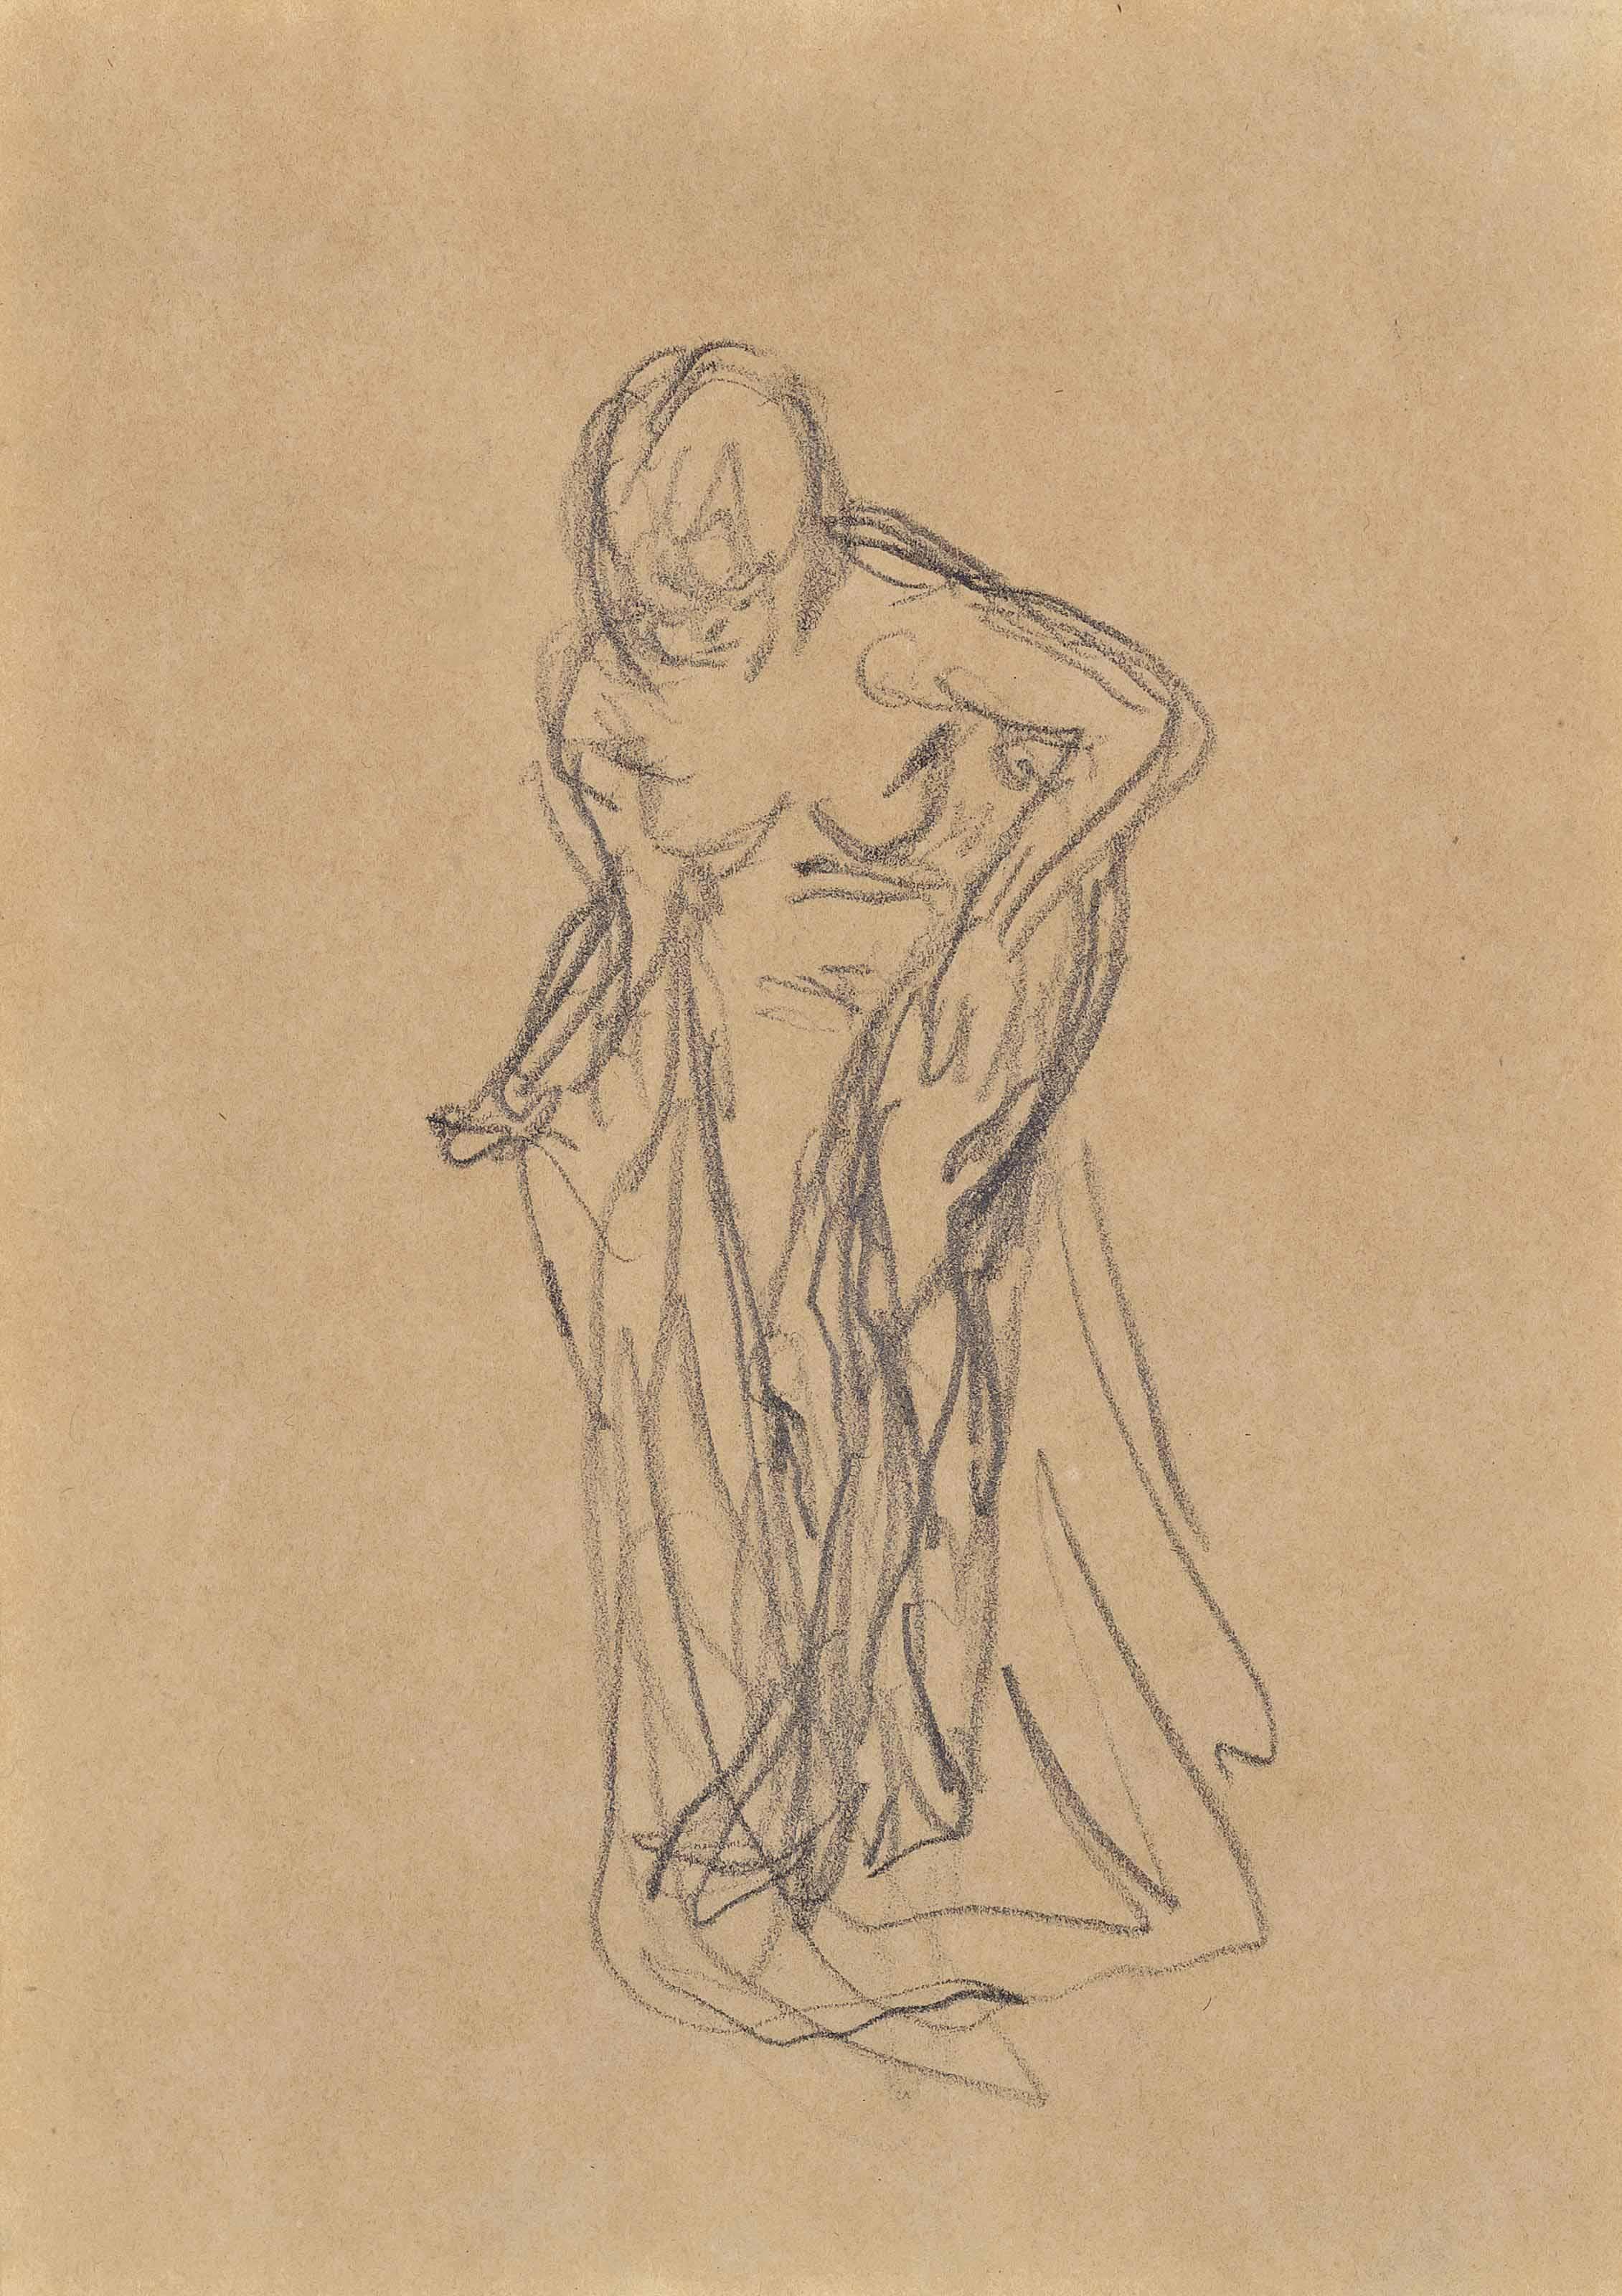 Pierre Bonnard (French, 1867-1